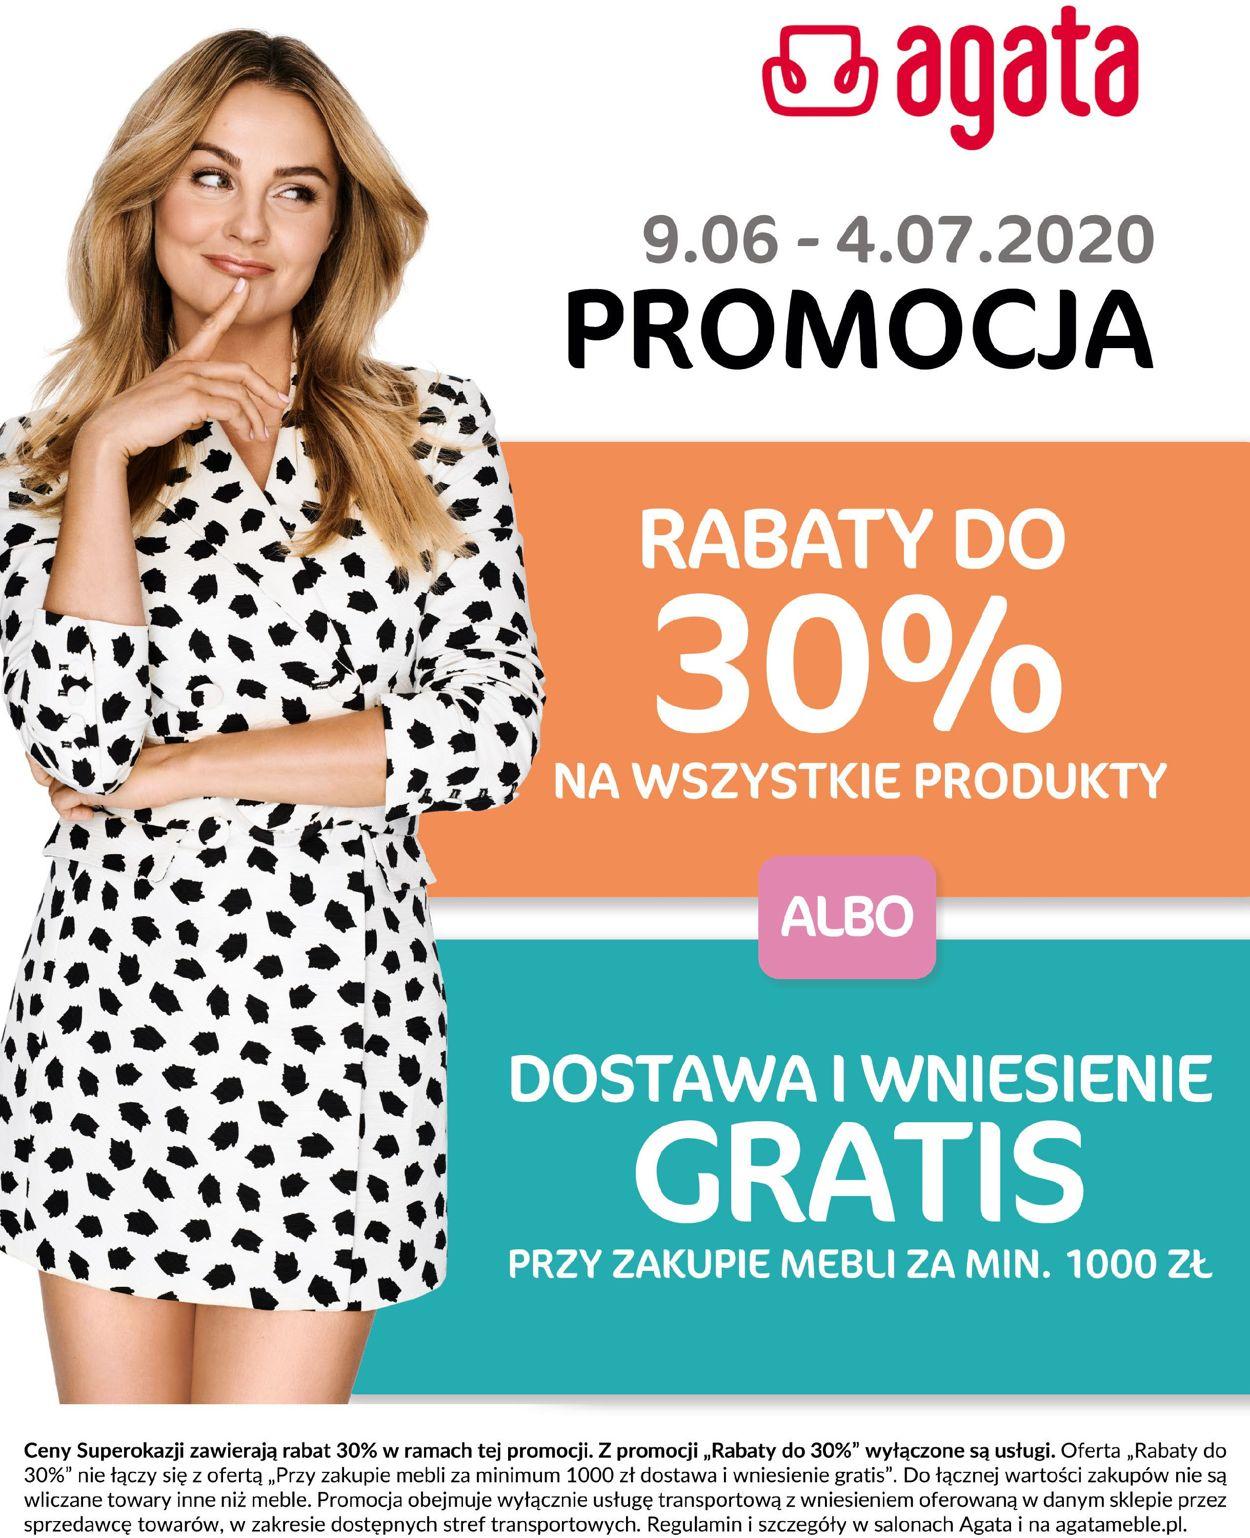 Gazetka promocyjna Agata Meble - 09.06-04.07.2020